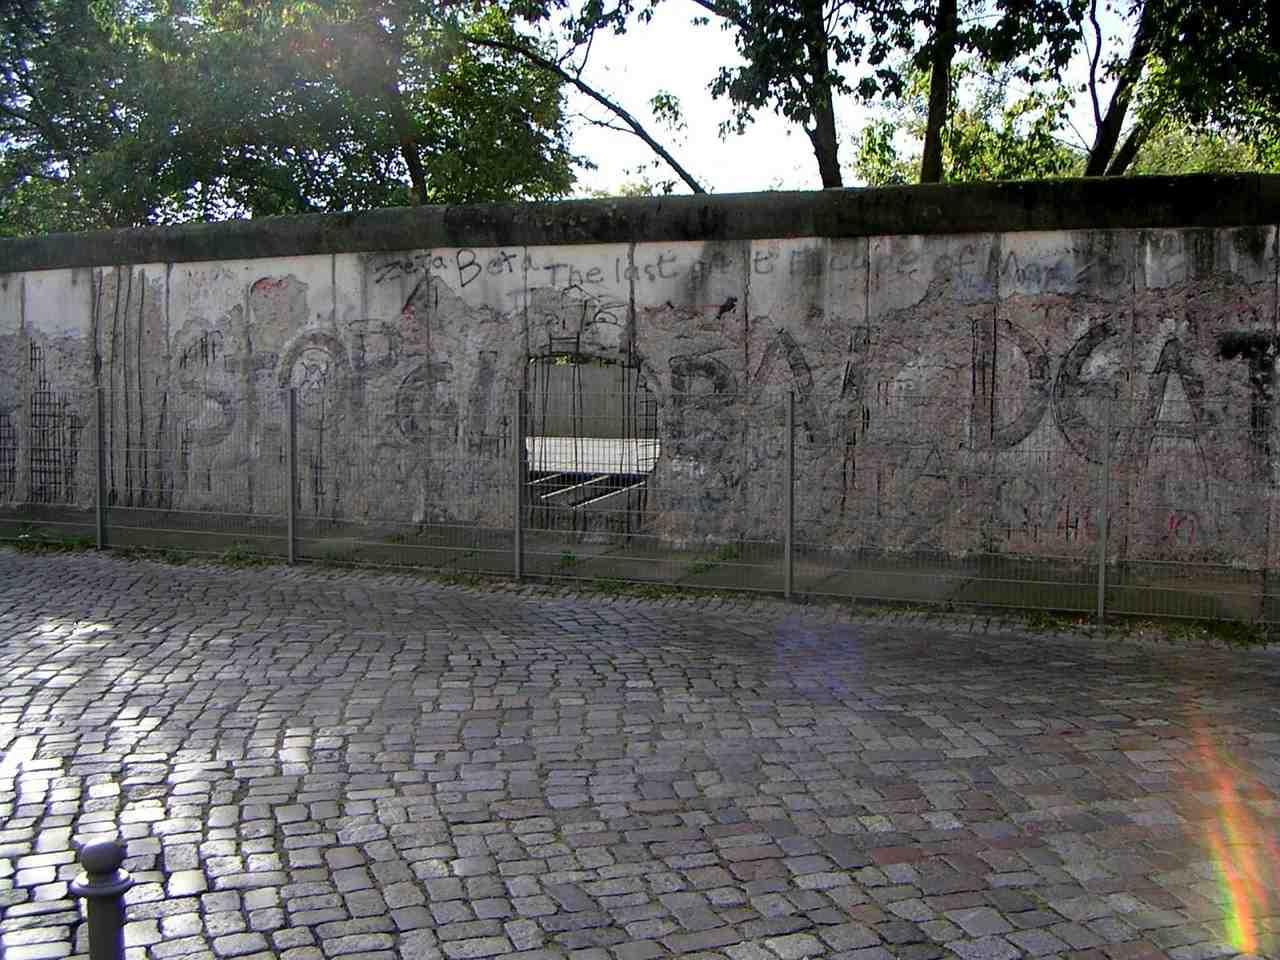 Berlin Wall Memorial, Berlin Attractions, Germany